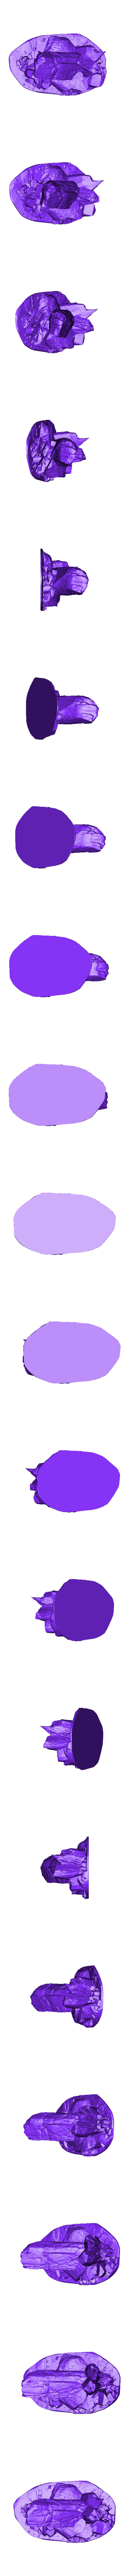 Rocks_05.stl Download STL file ROCKY TERRAIN • 3D printing object, Txarli_Factory